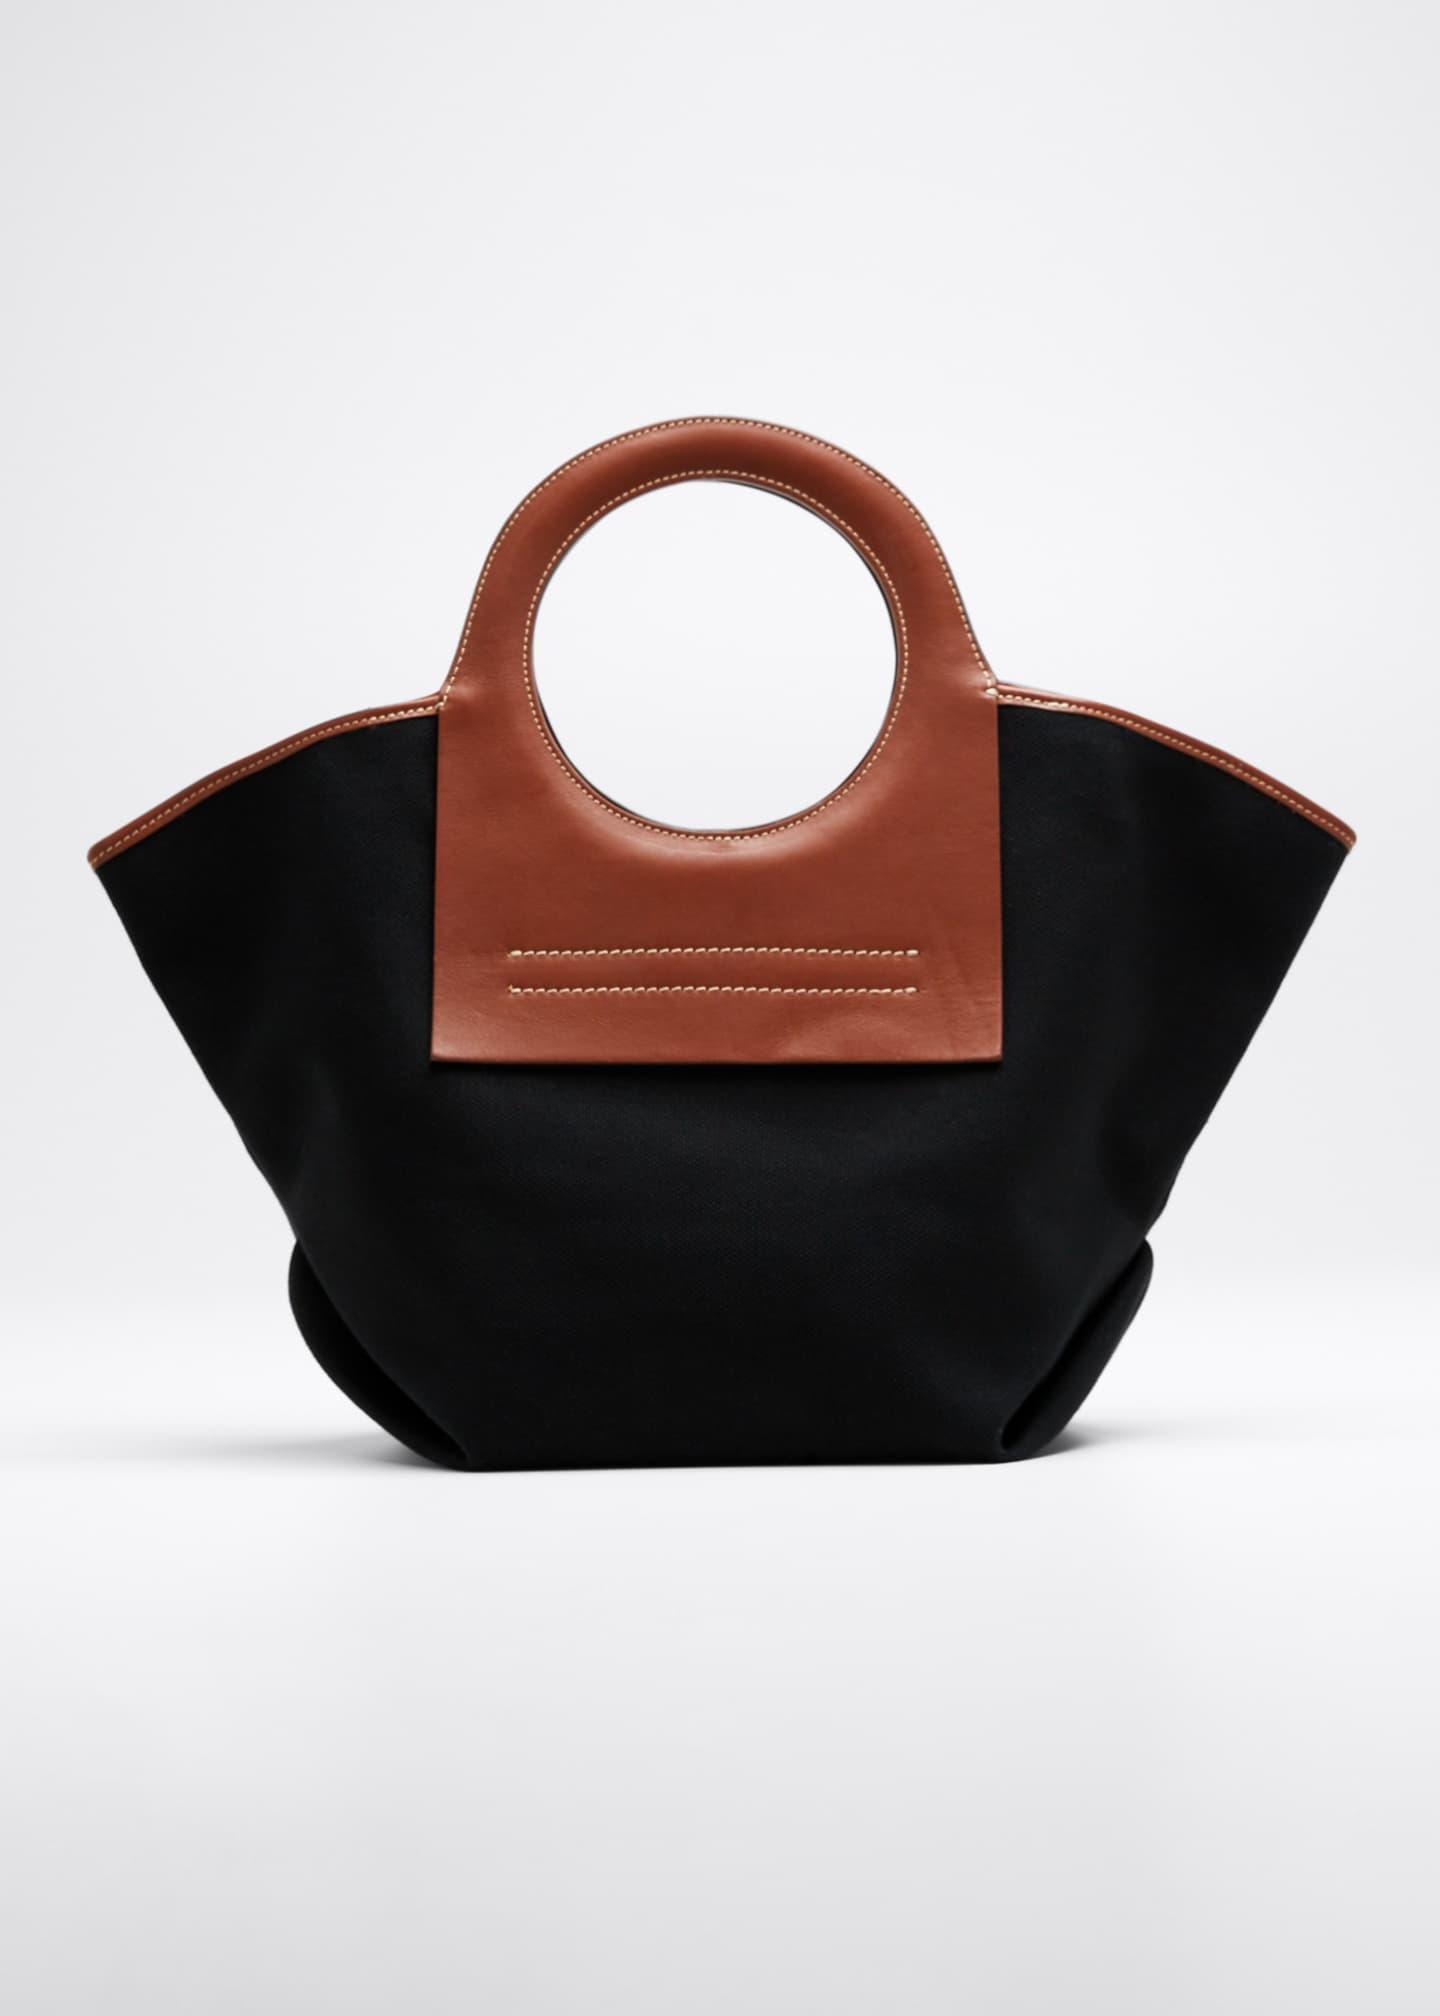 HEREU Cala Two-Tone Canvas Small Tote Bag